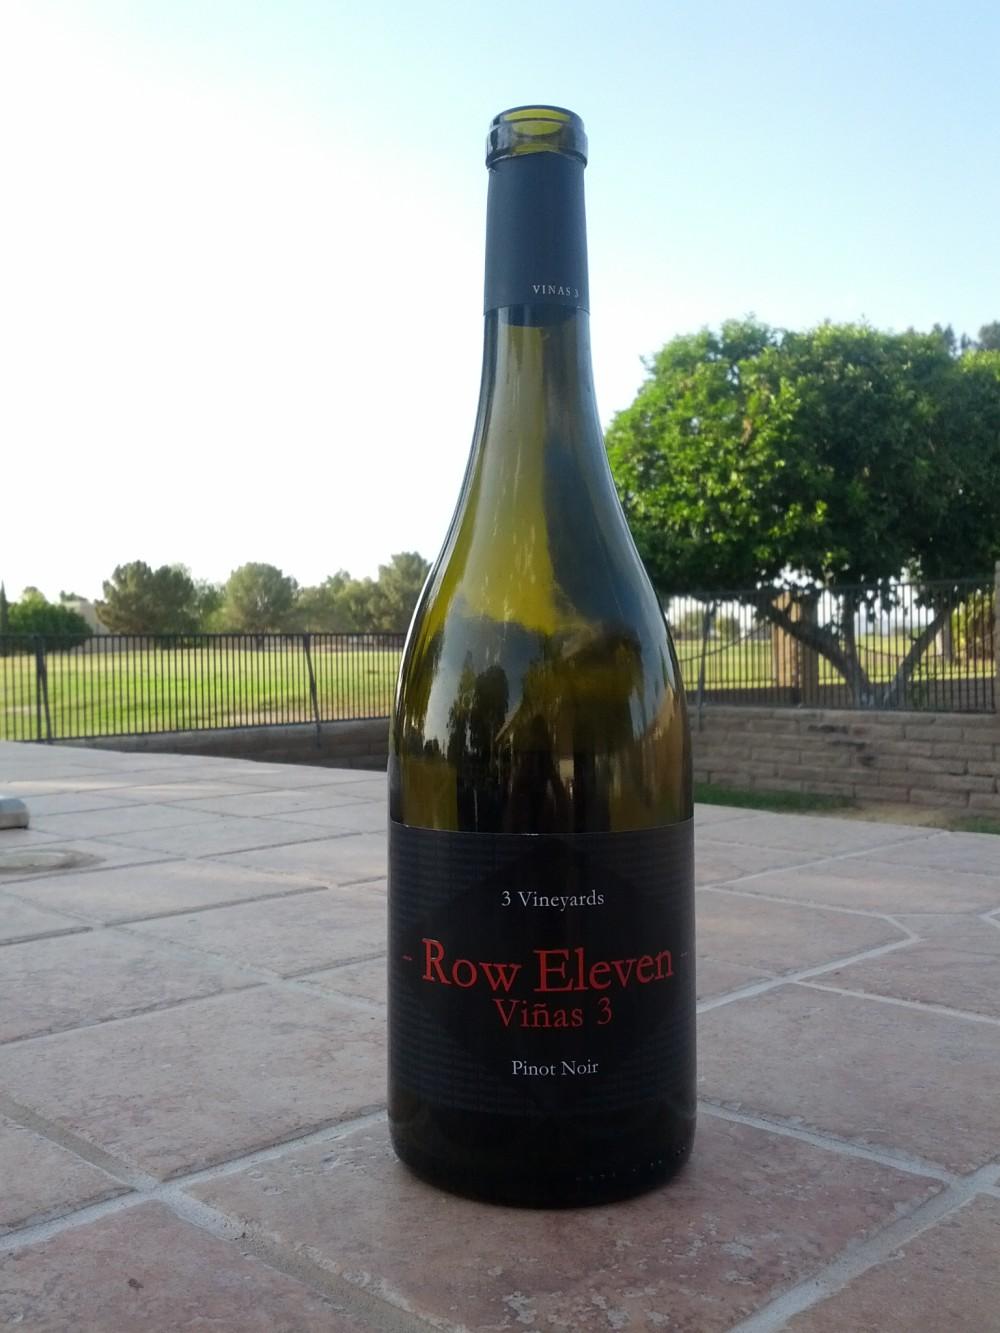 Row Eleven Vinas 3 Pinot Noir Vintage 2009